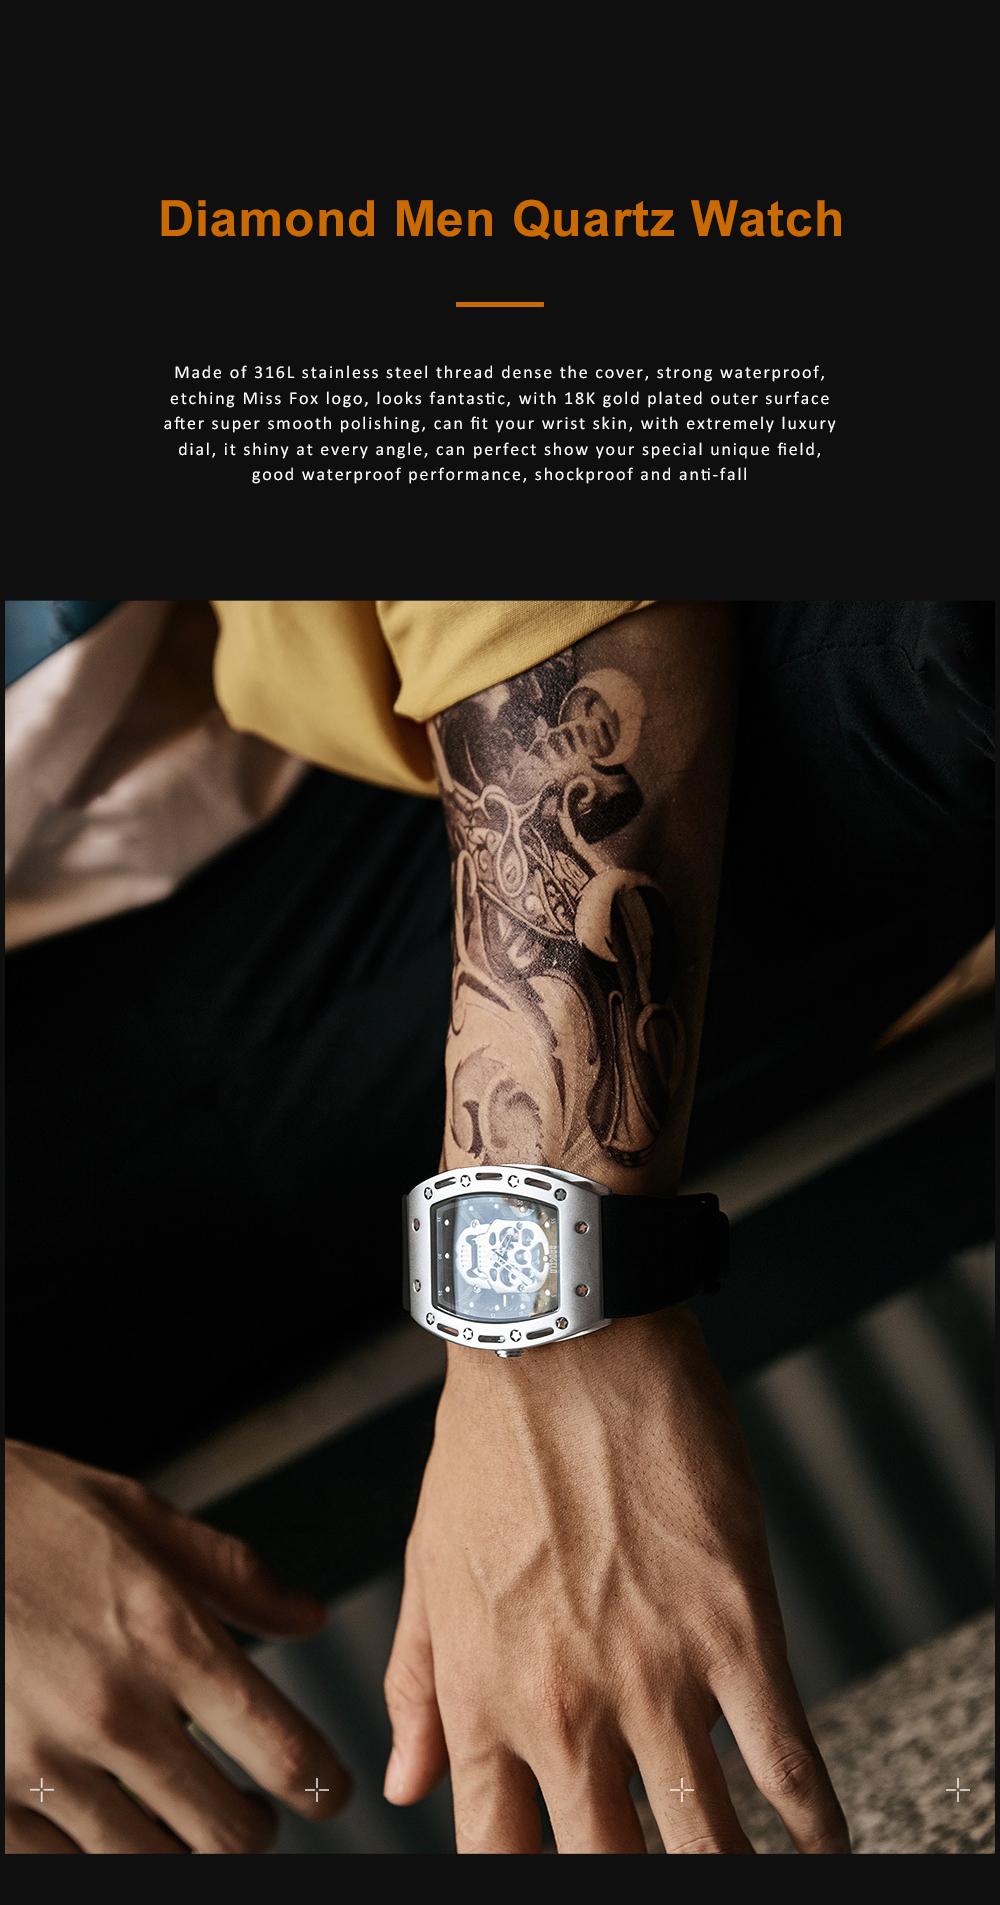 2020 Hot Sell Watches Men Luxury Brand Automatic Silicone Shantou Hollow Men's Quartz Watch Waterproof Movement 0